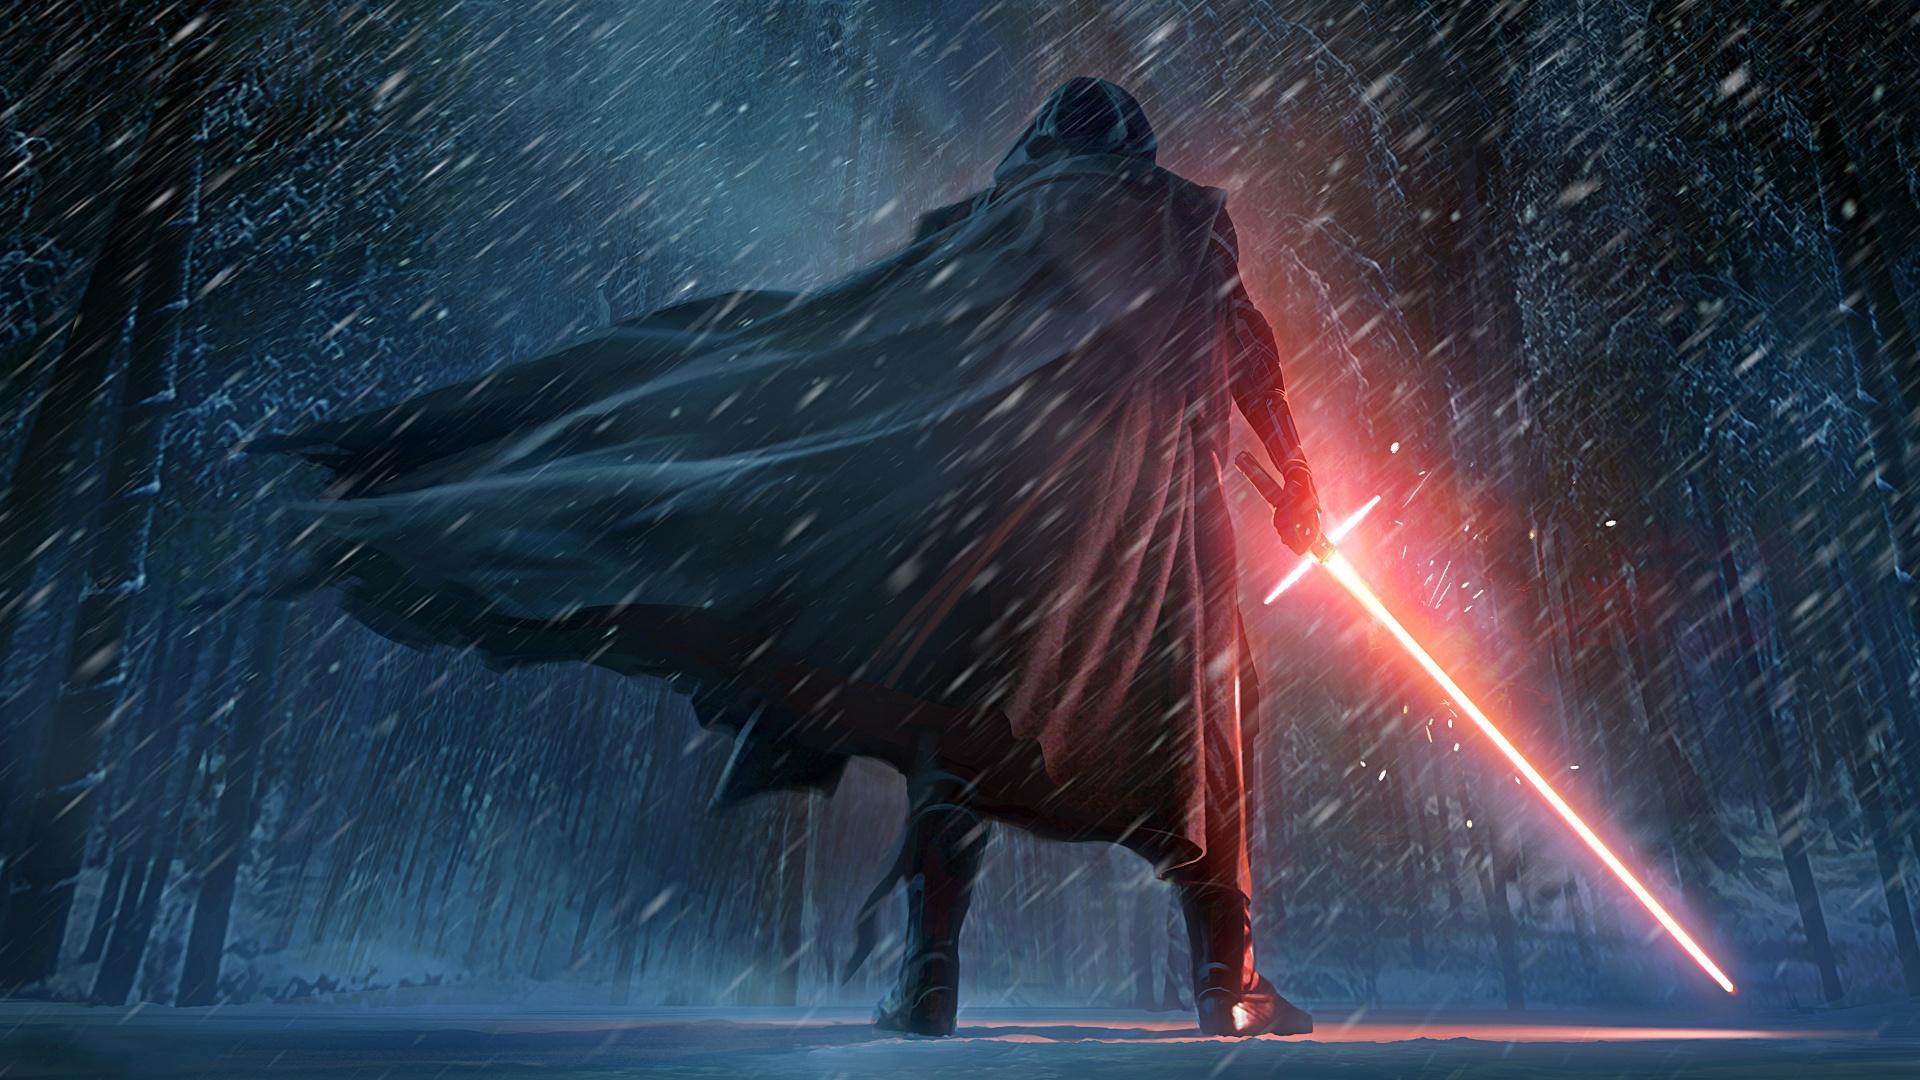 Kylo Ren Star Wars The Force Awakens Artwork Wallpapers HD 1920x1080